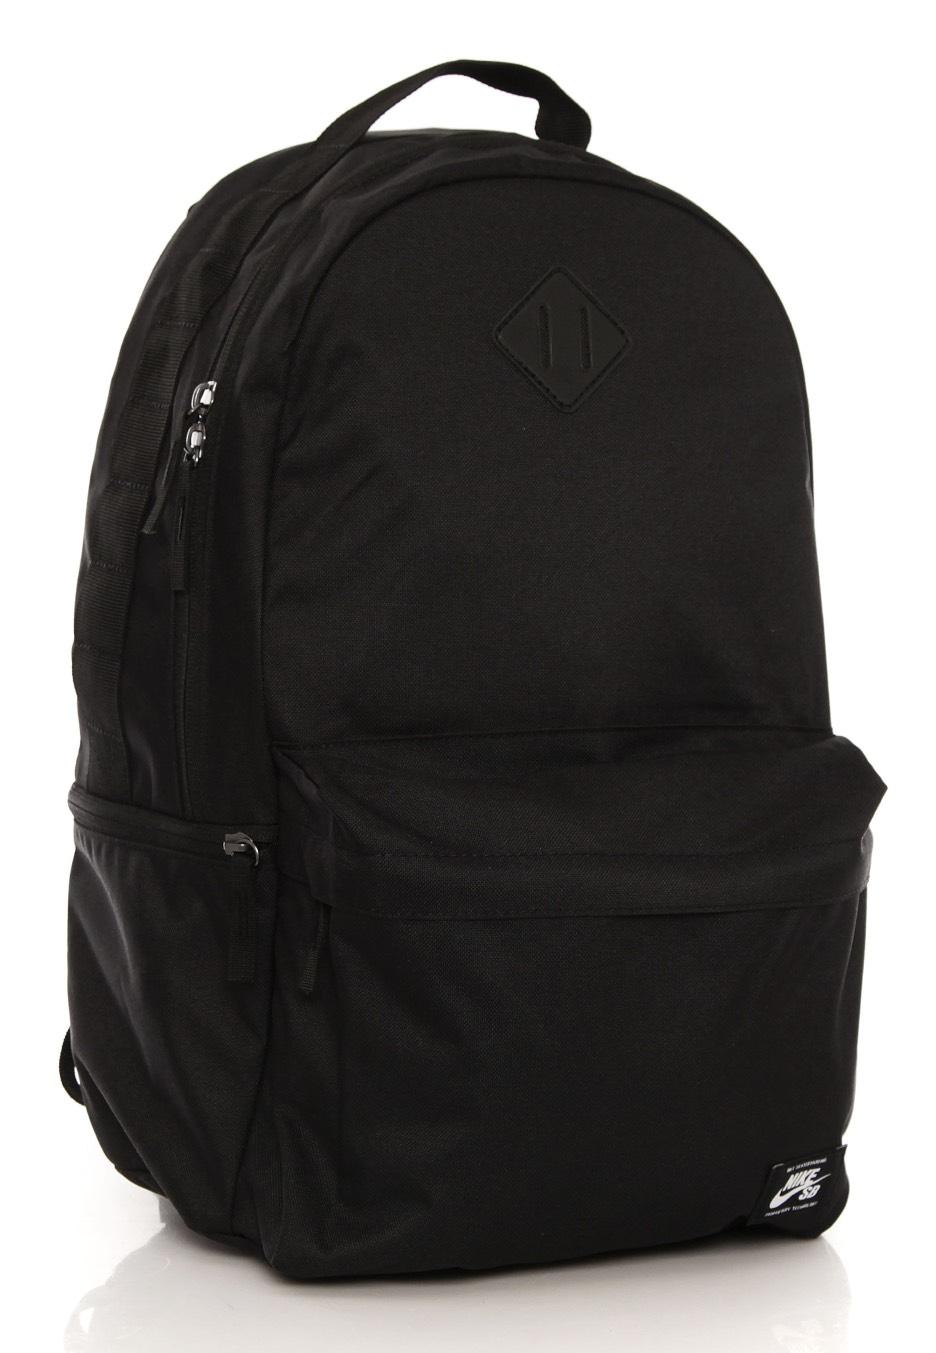 Privilegiado acceso Diez años  Nike - SB Icon Black/White - Backpack - Impericon.com UK